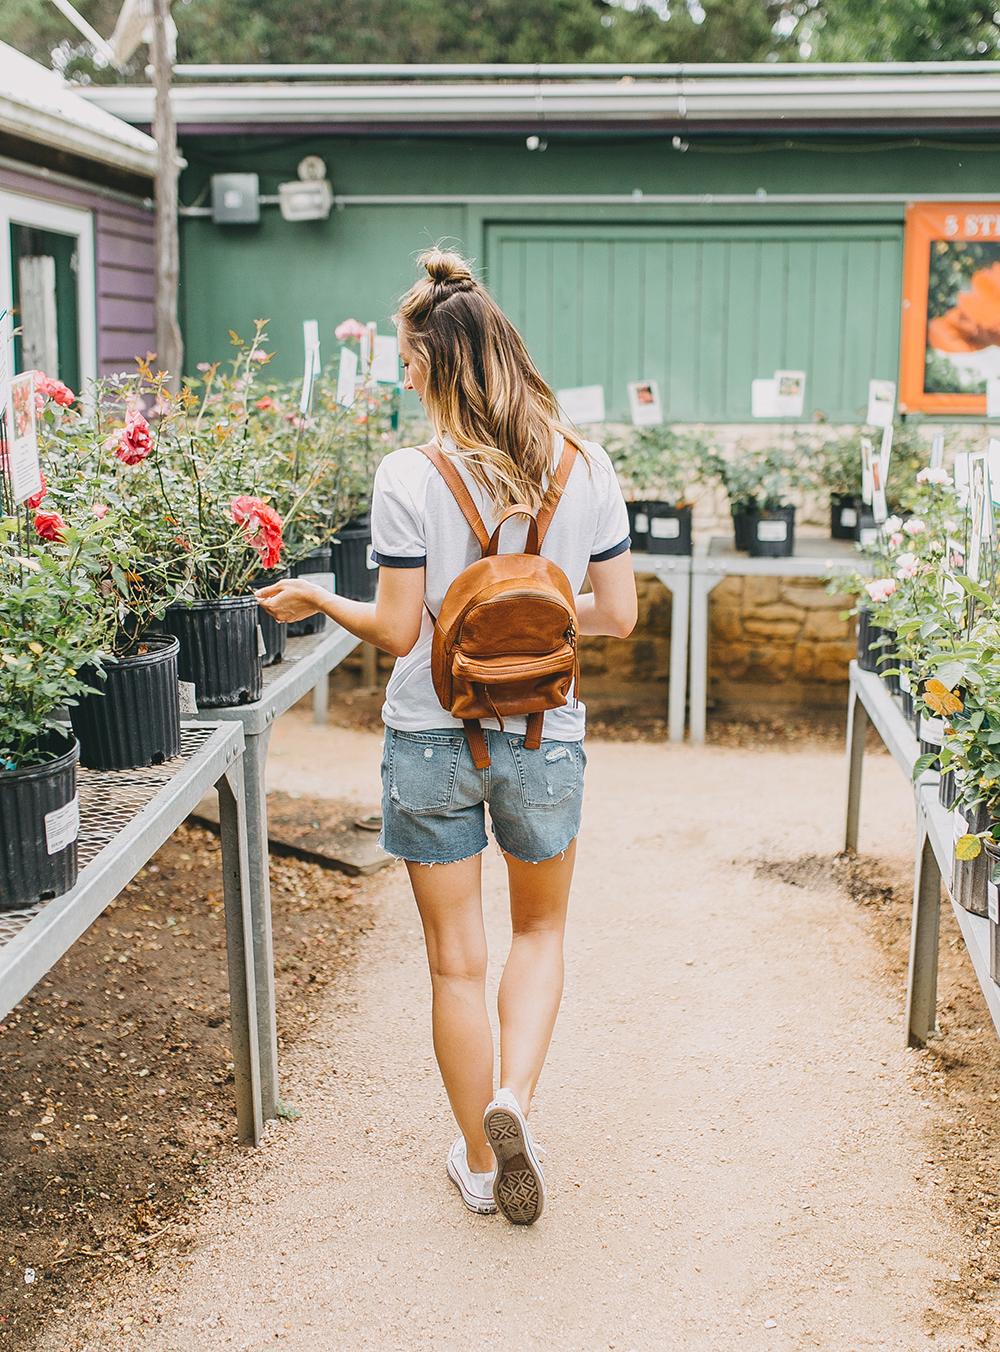 livvyland-blog-olivia-watson-austin-texas-fashion-blogger-natural-gardener-tee-boyfriend-shorts-denim-cutoffs-easy-summer-outfit-idea-treasure-bond-nordstrom-7